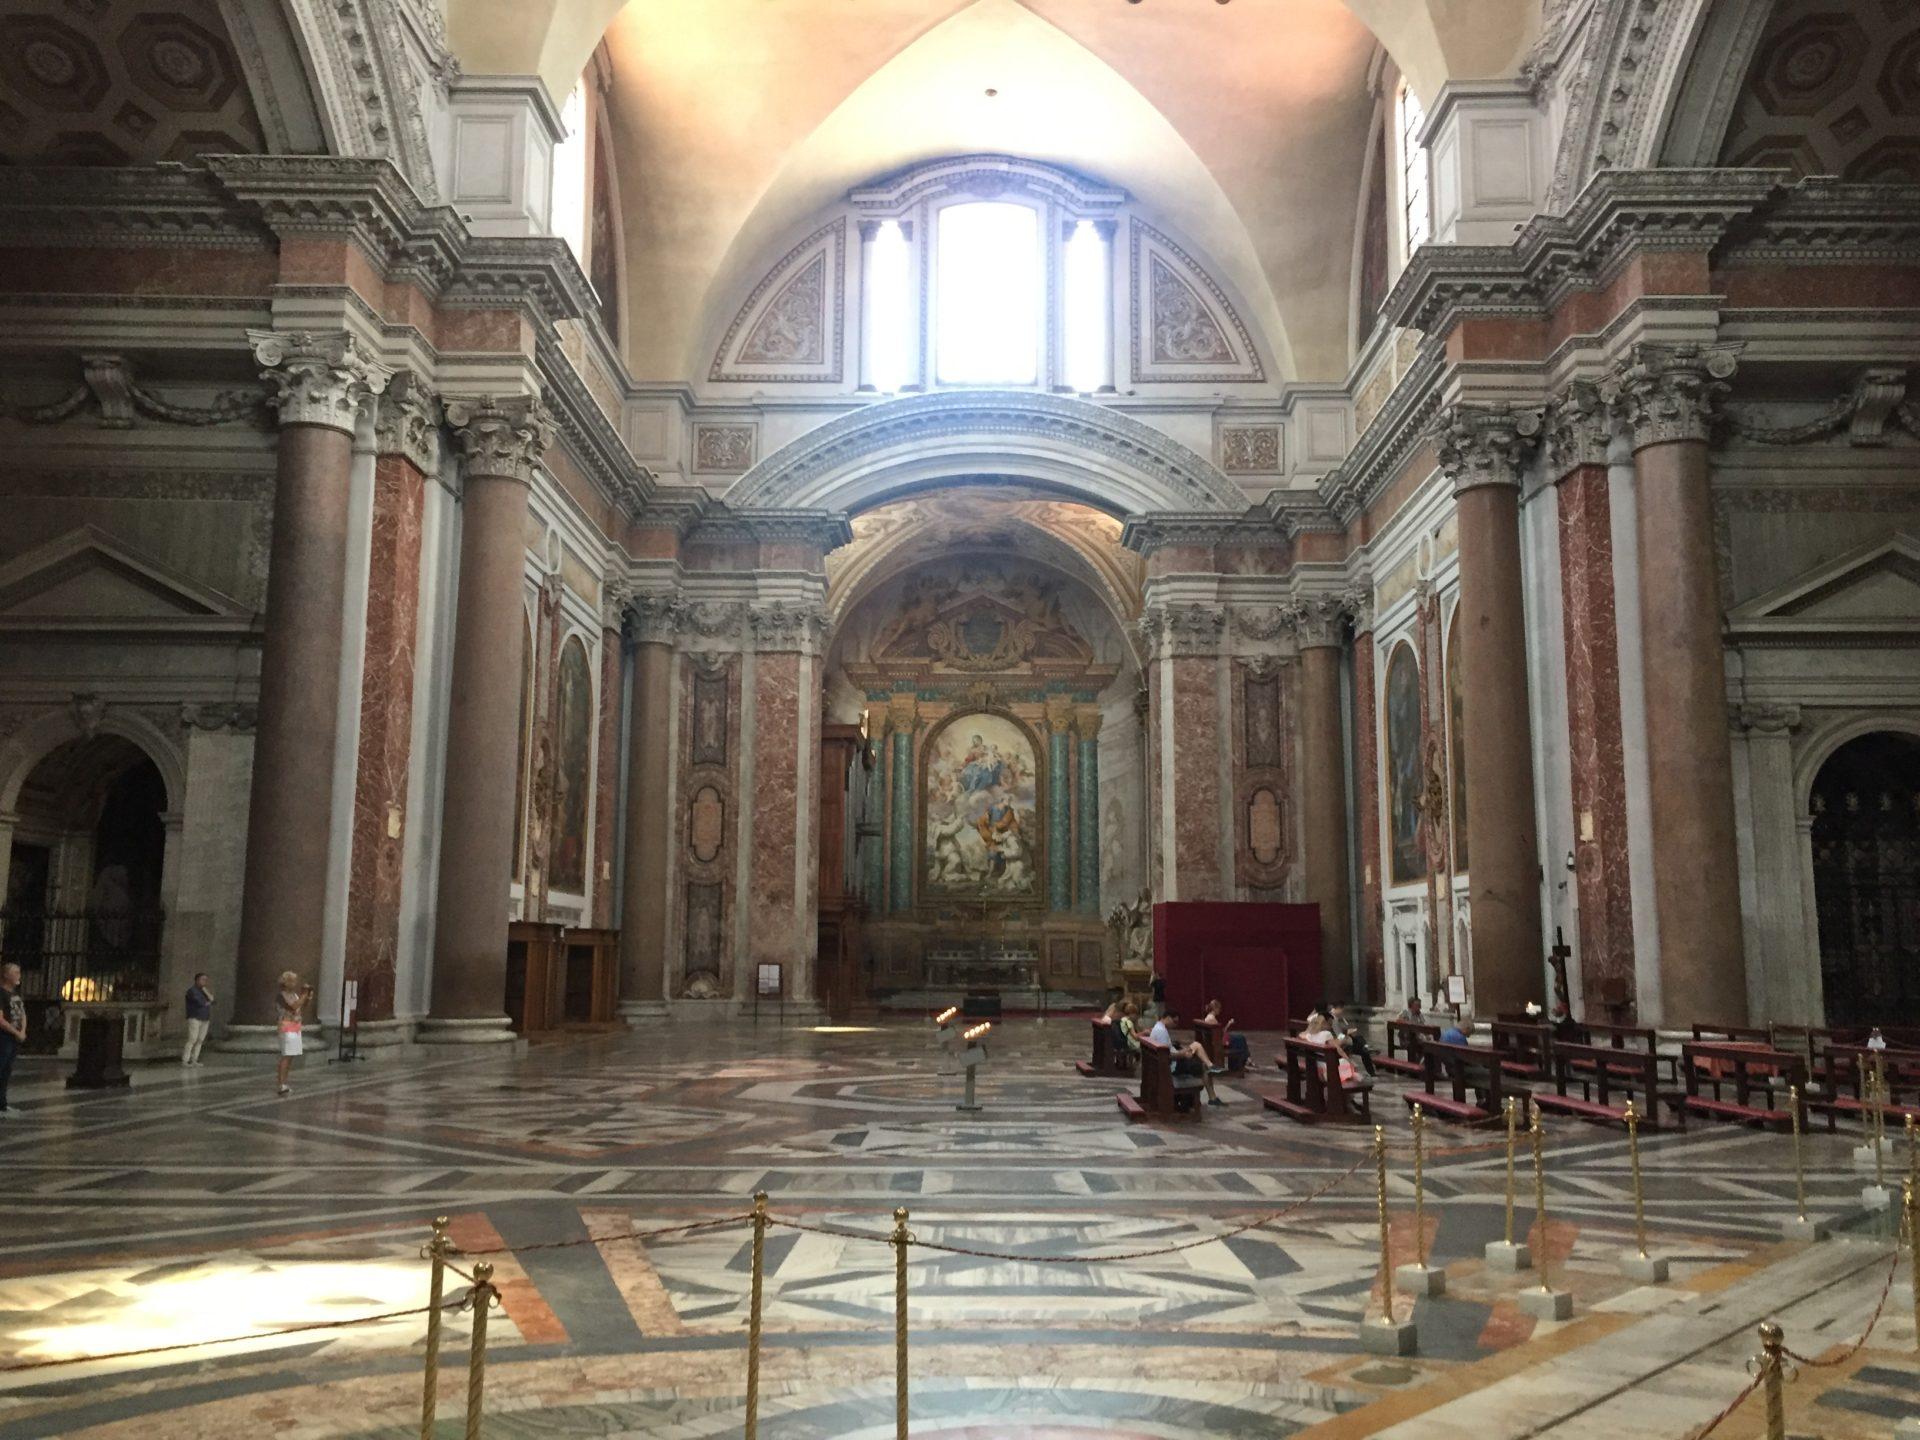 "<img src=""http://marenostrum.pl/wp-content/uploads//2019/11/degli-angeli-et-dei-martiri-2.jpeg"" alt=""wnętrze kościoła Santa Maria degli Angeli et Martiri"" />"